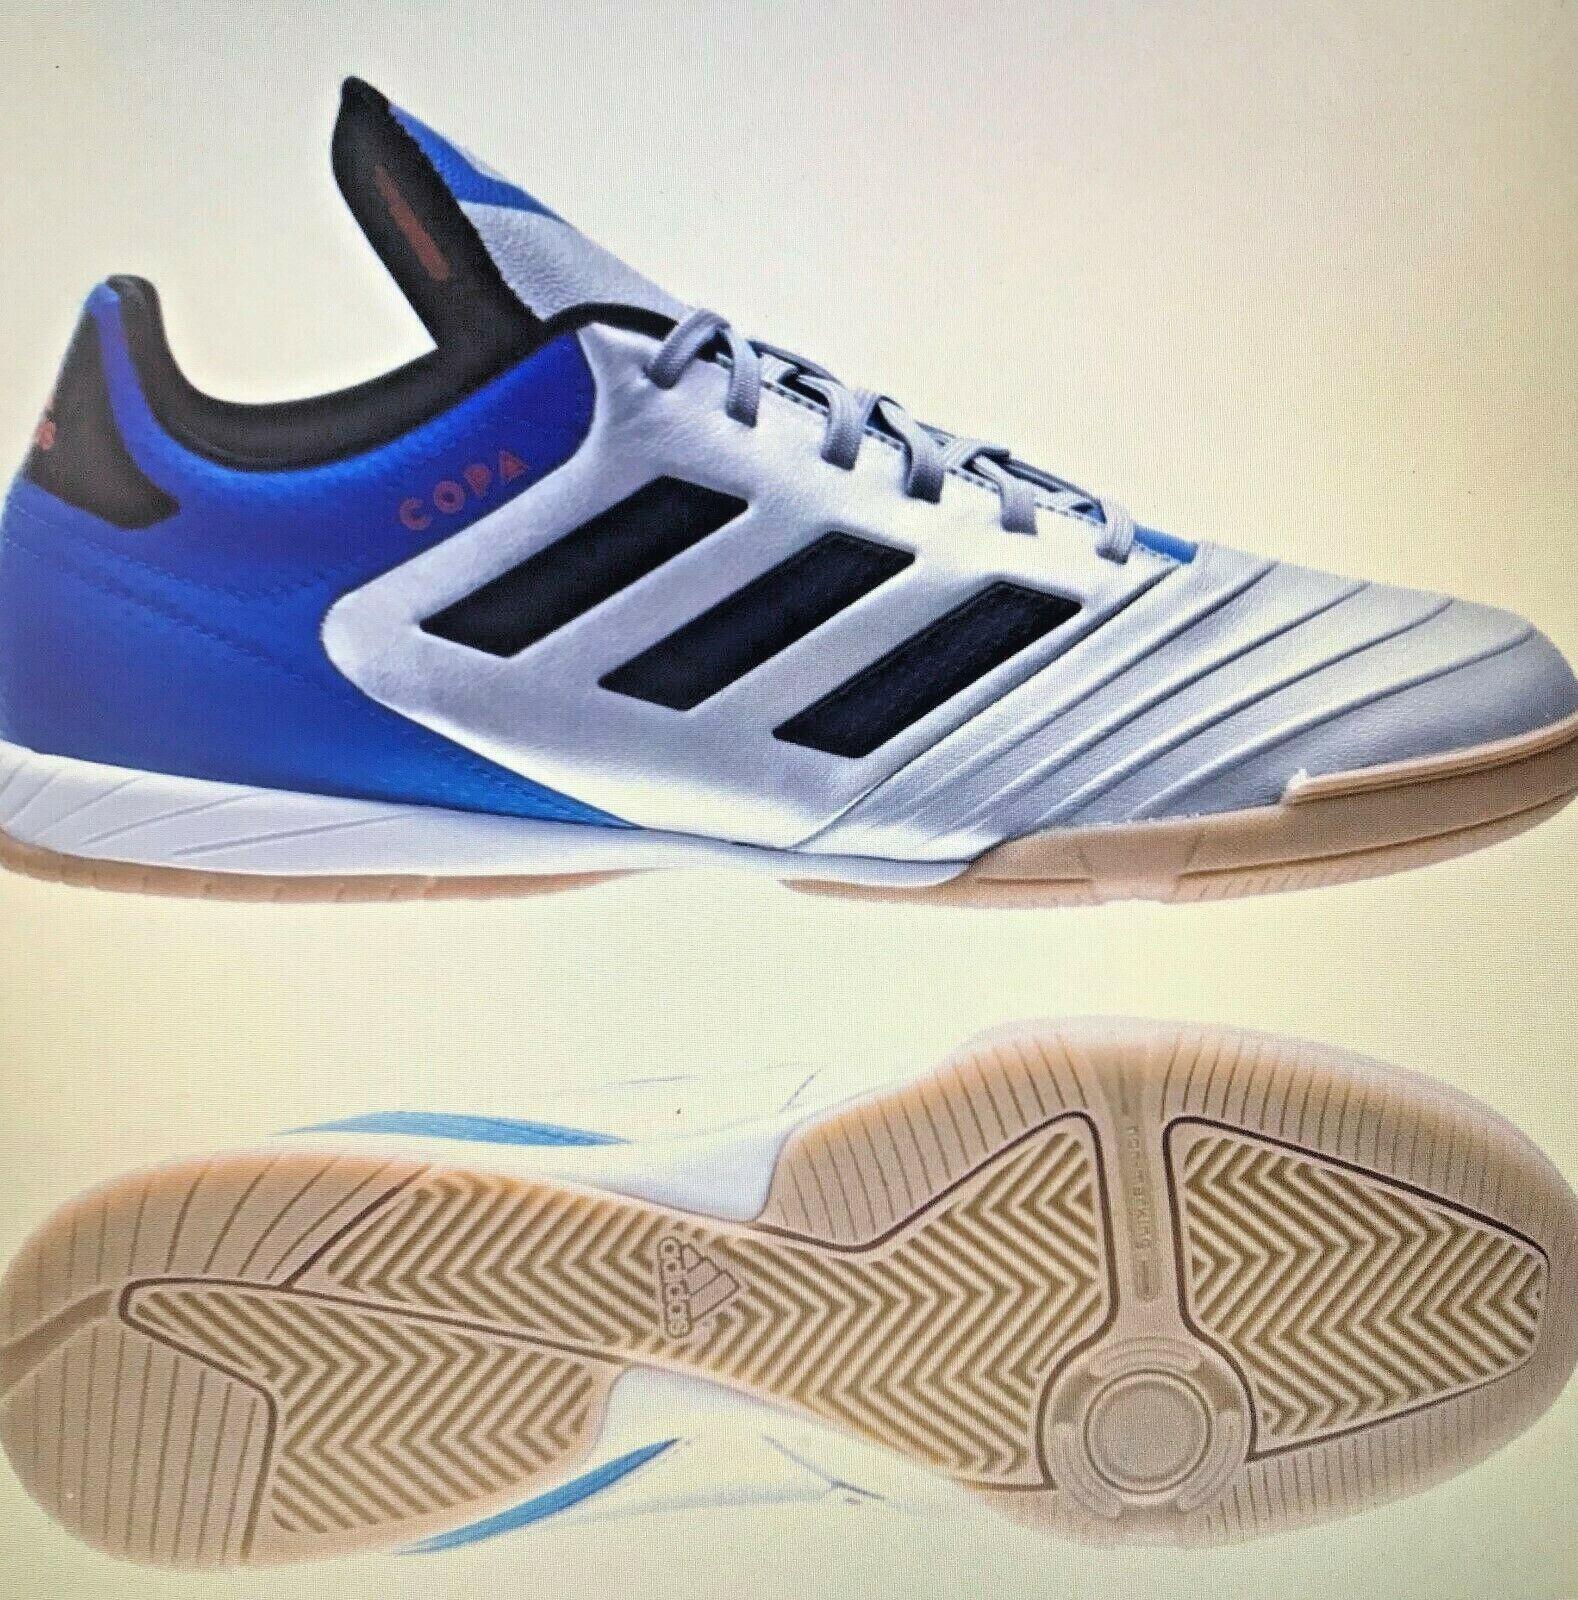 Adidas COPA TANGO 18.3 IN Trainers DB2452